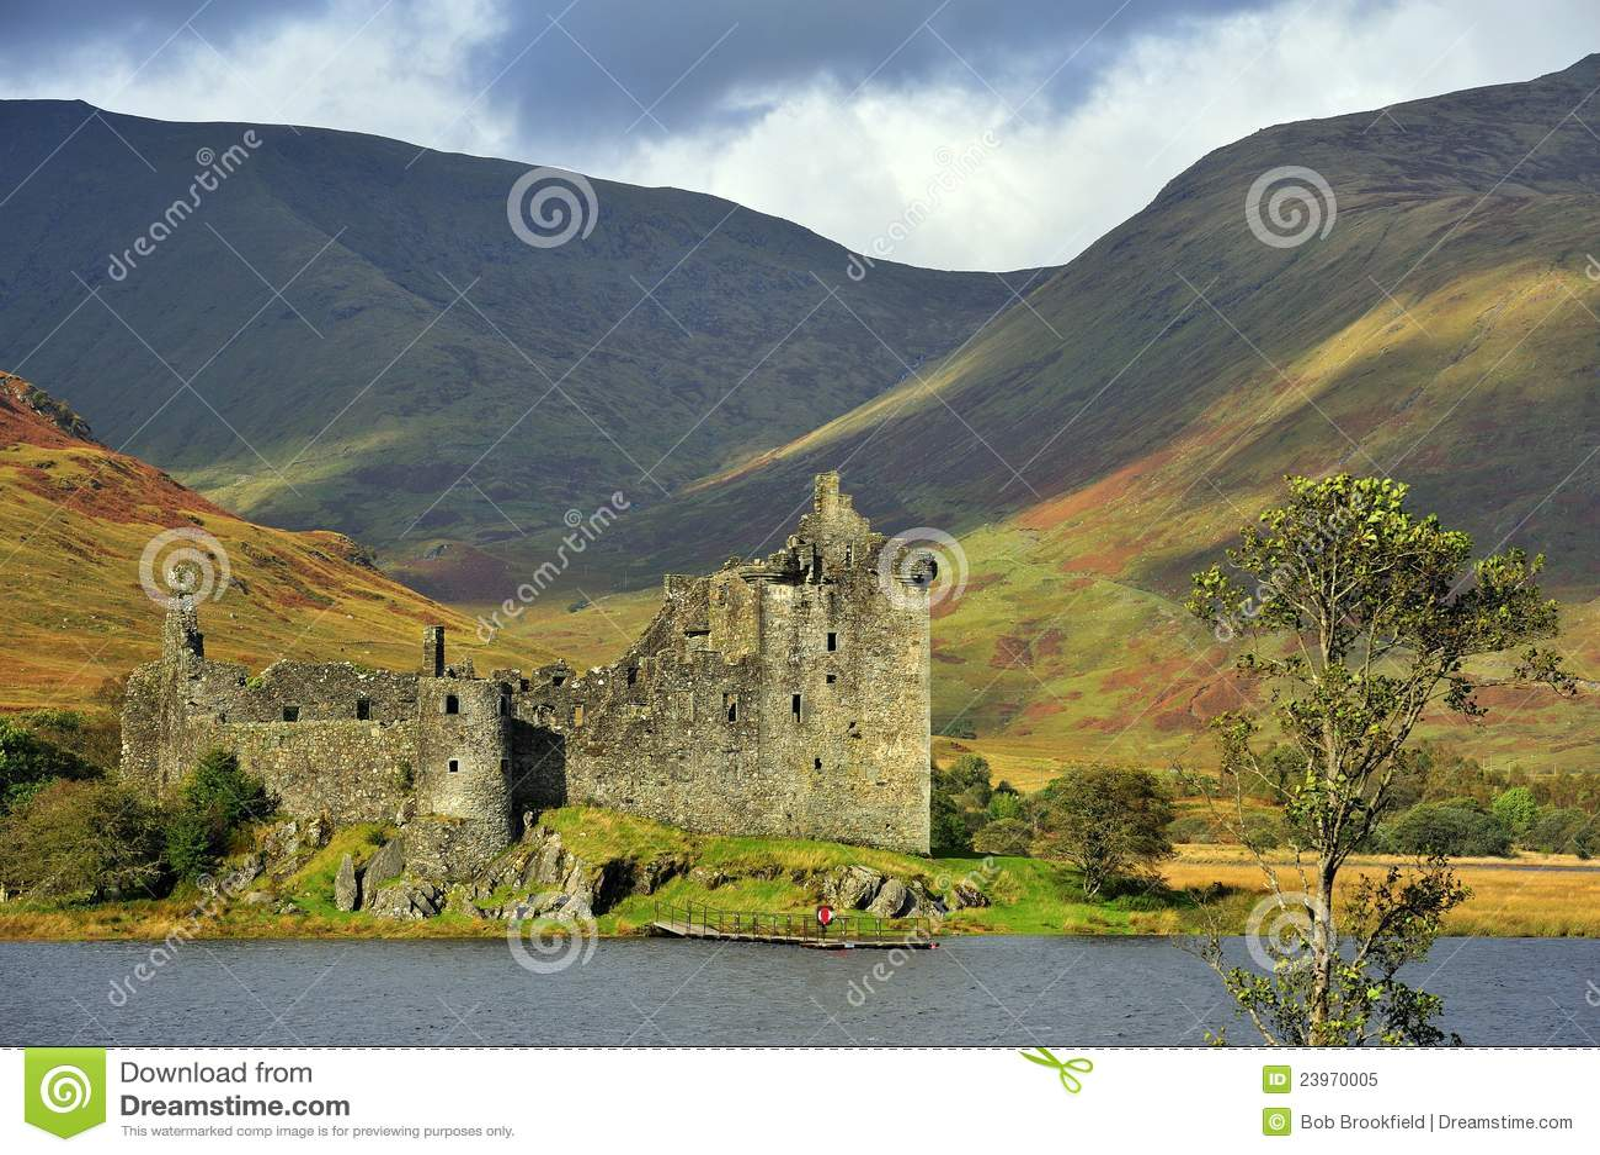 Highland castle, Kilchurn, Scotland